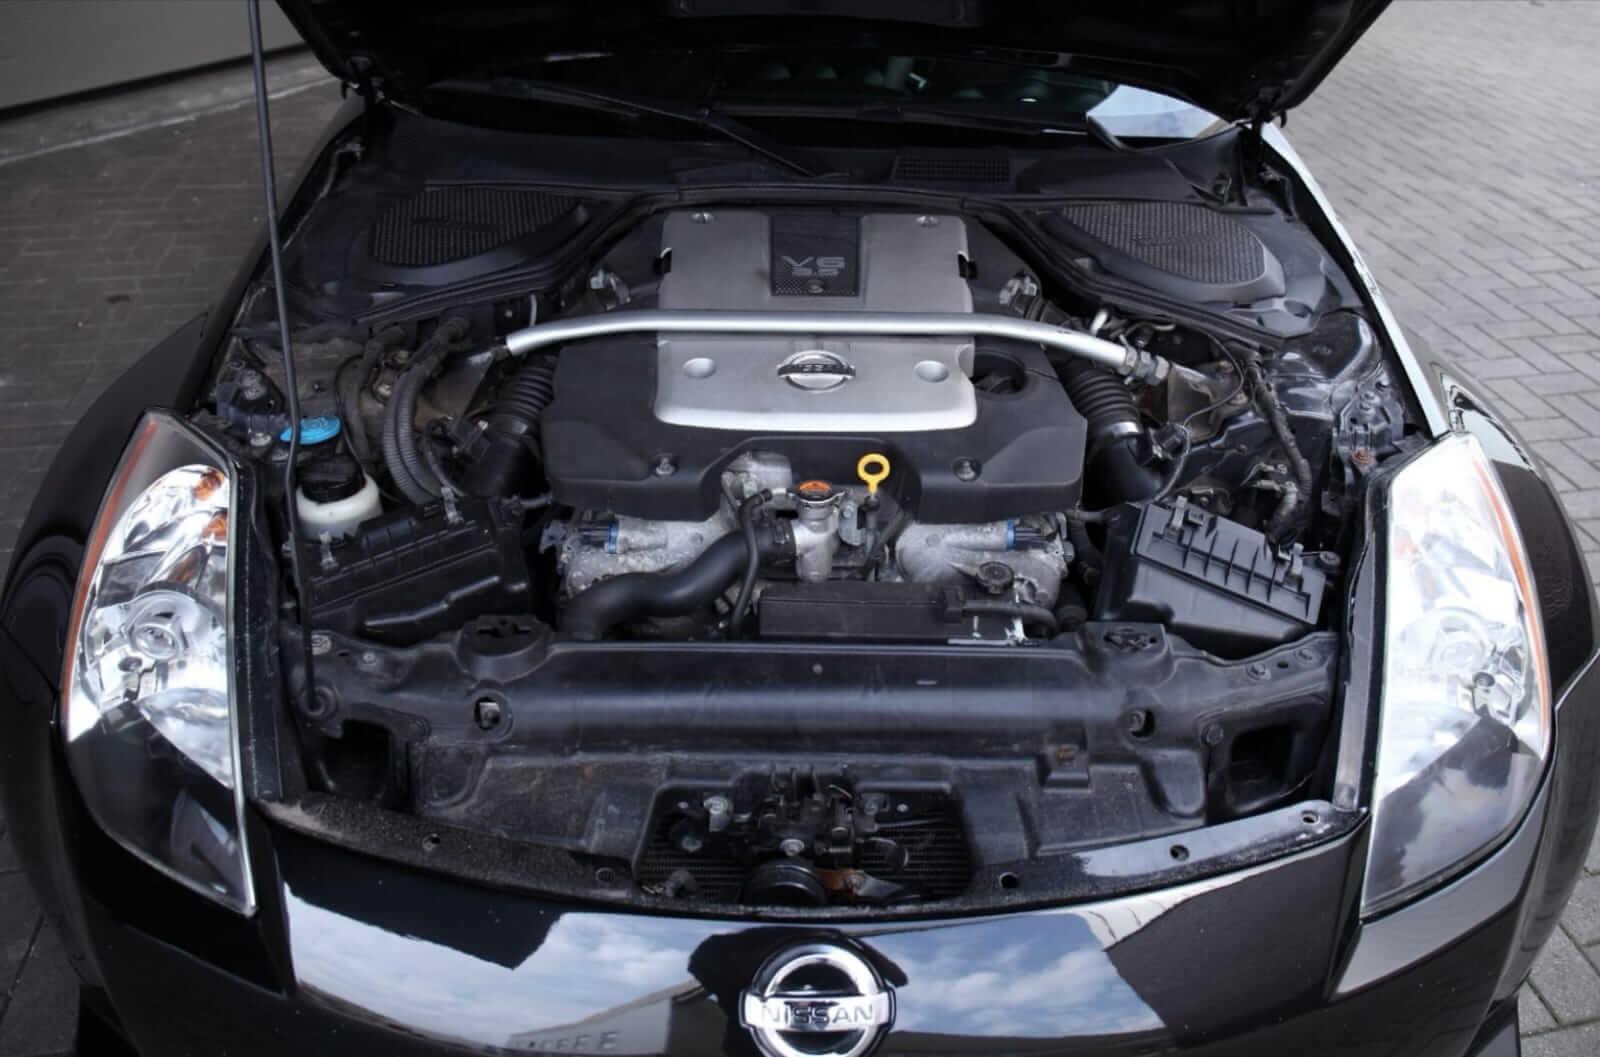 Nissan 350Z HR Track Edition 2008 engine bay – by Next Level Automotive – Go to nextlevelautomotive.eu